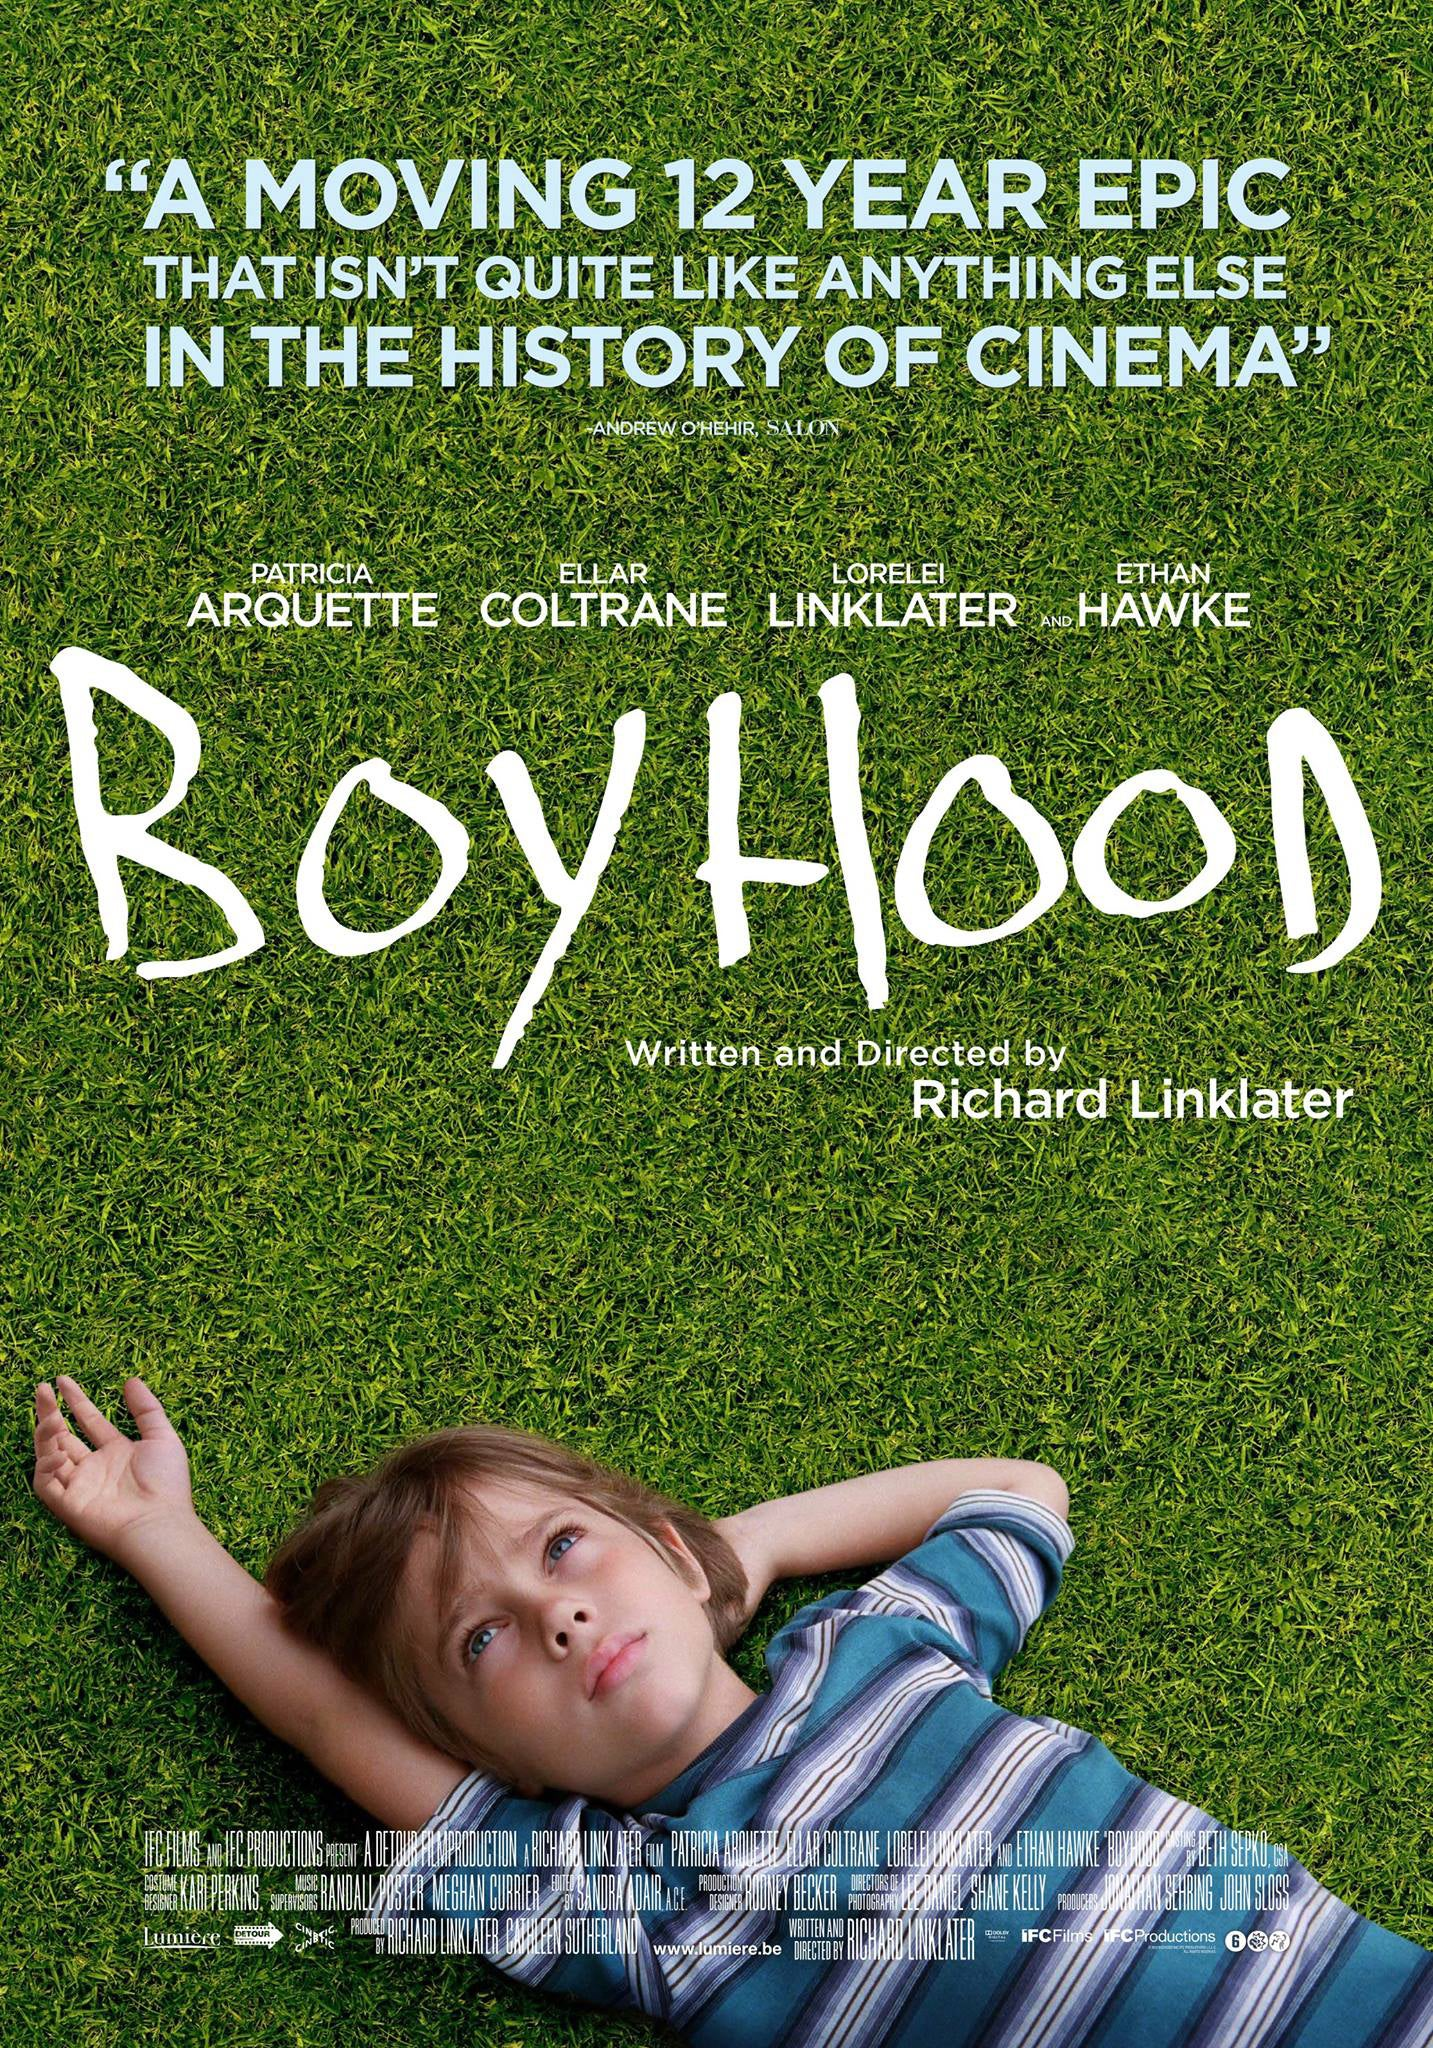 2015 - Drama: Boyhood | Golden Globes